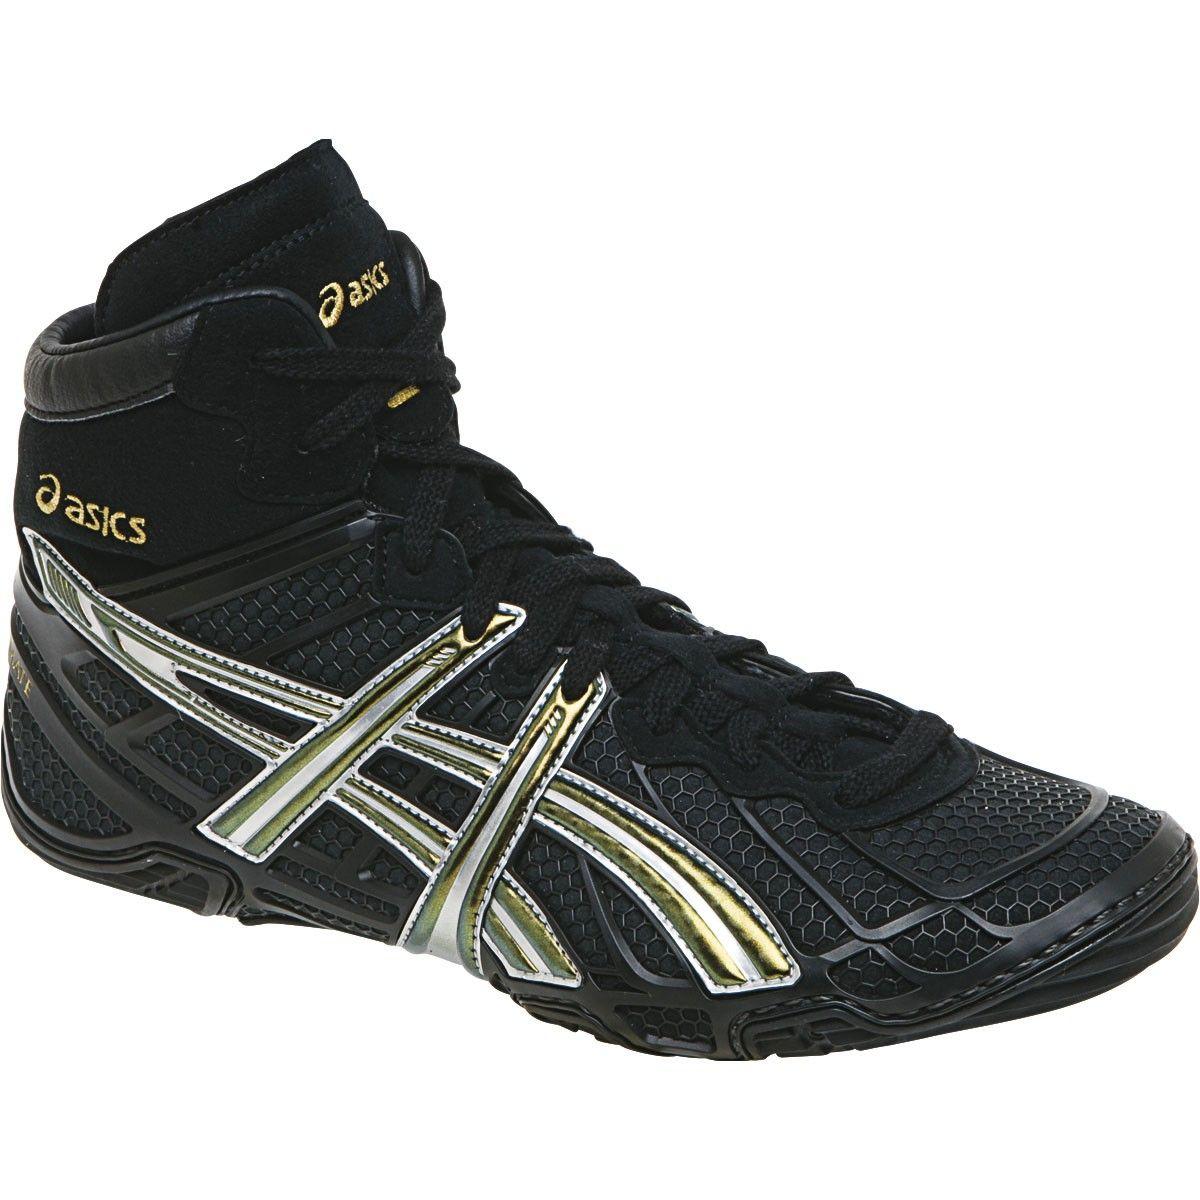 f8c07e9865dde Men s Dan Gable Ultimate 2 Wrestling Shoes - Black Champion Silver- size 7